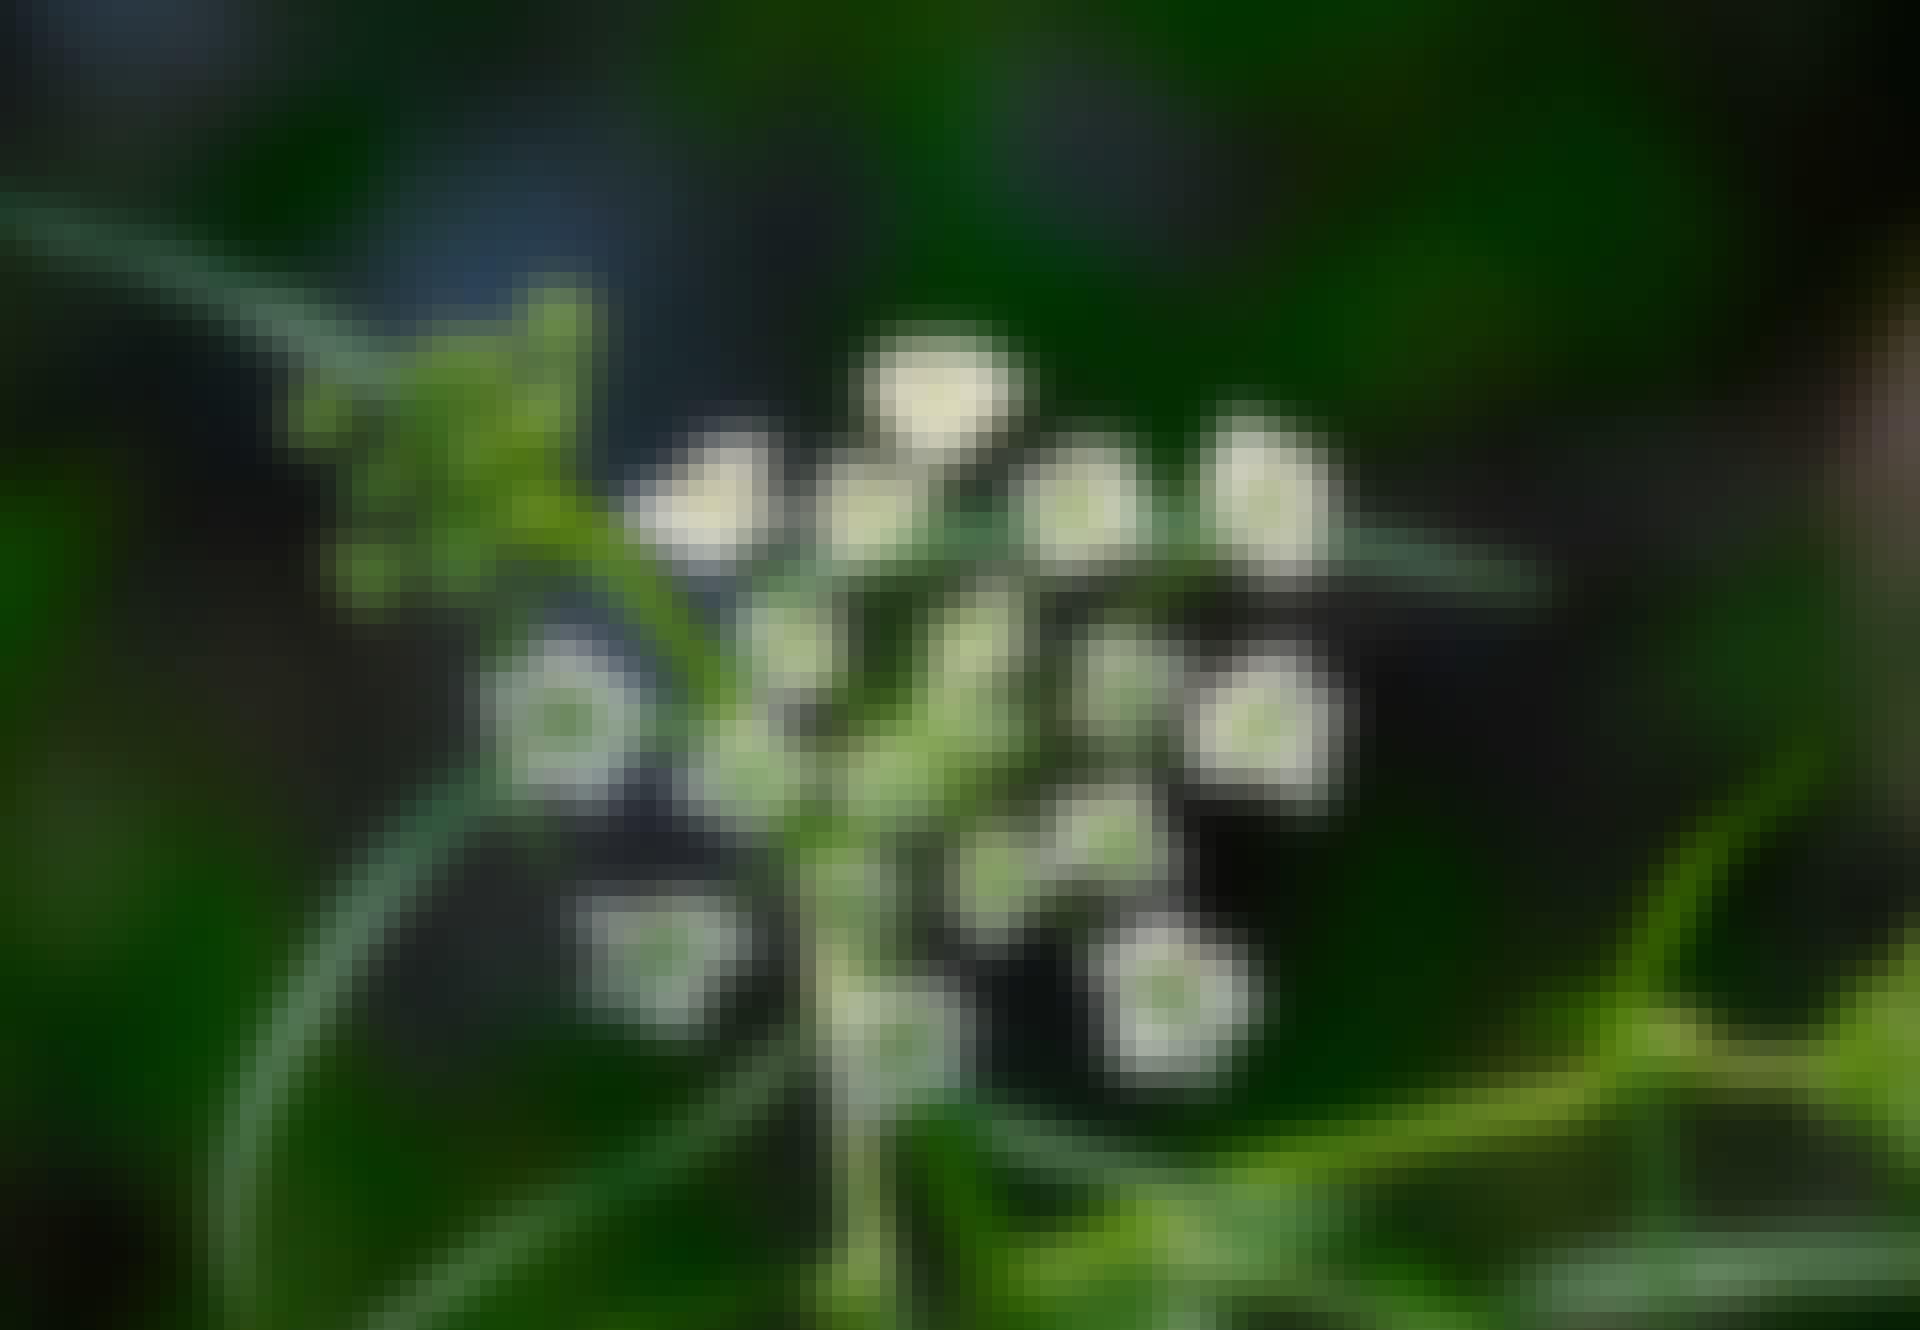 Myrkyllinen kasvi